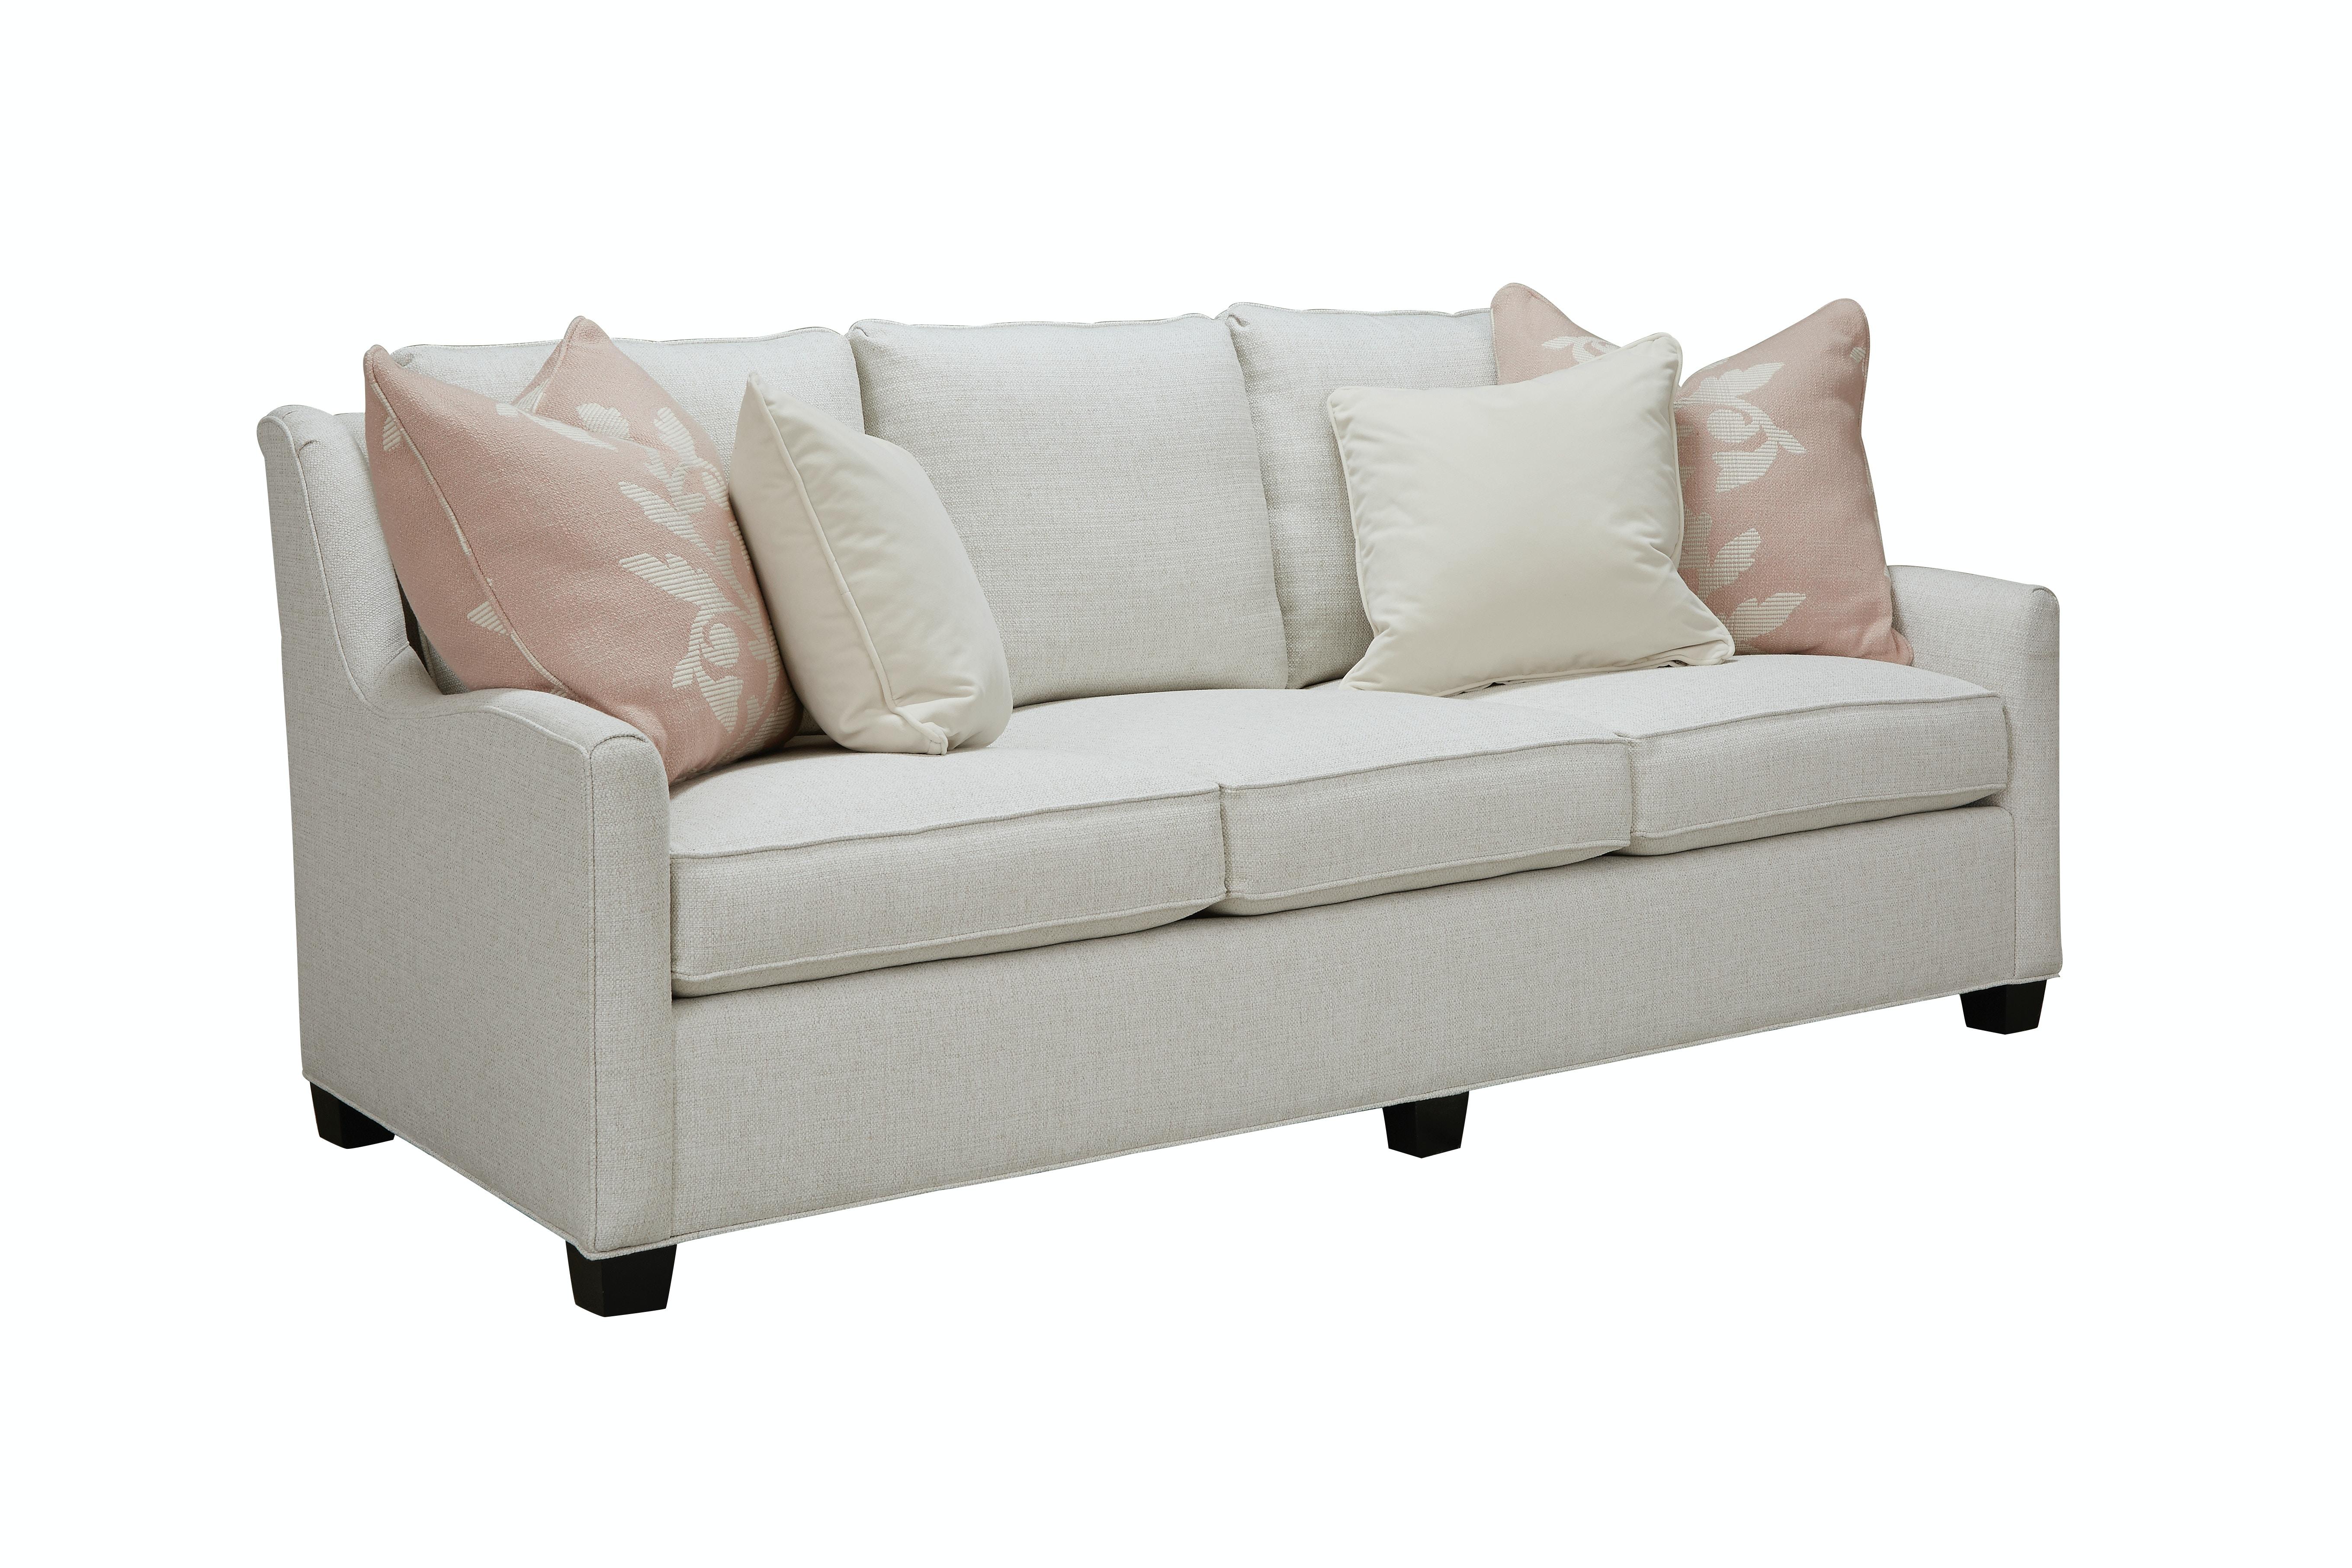 Southern Furniture LaRue 7ft Sofa   3 Over 3 23851